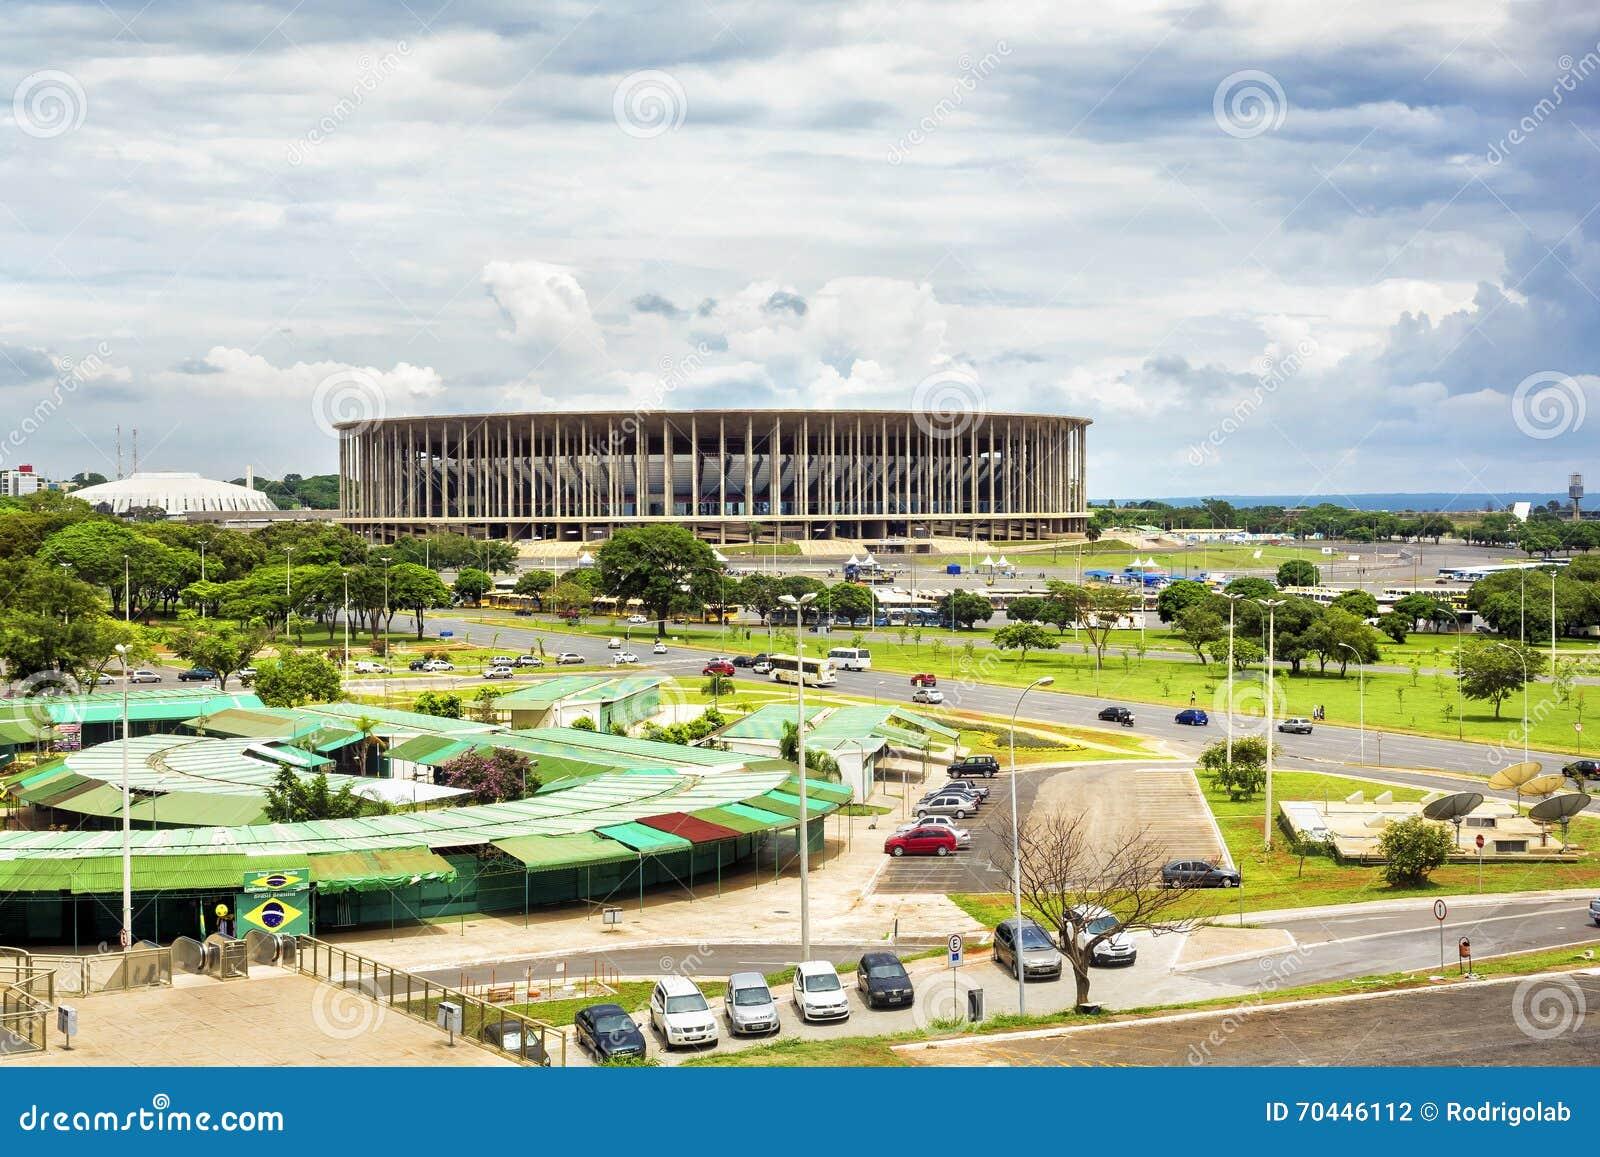 Mane Garrincha Stadium In Brasilia Hoofdstad Van Brazili